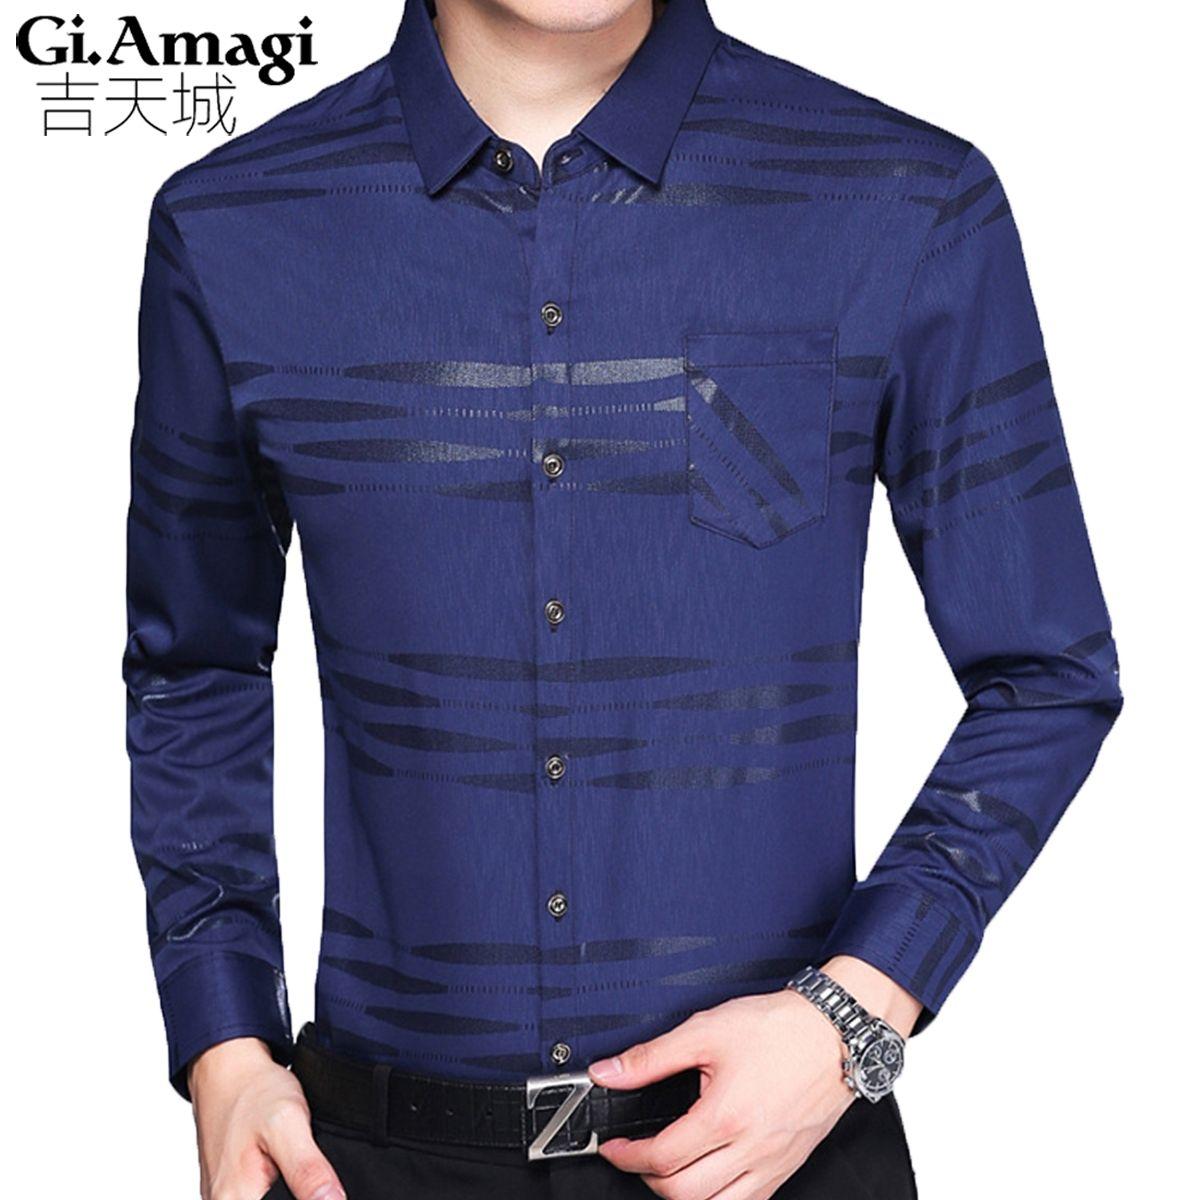 Roupas Masculinas New Autumn Plaid Shirt Casual Slim Printed Men s Shirt  Lapel Cotton Mens Shirt Men aee48ac99a